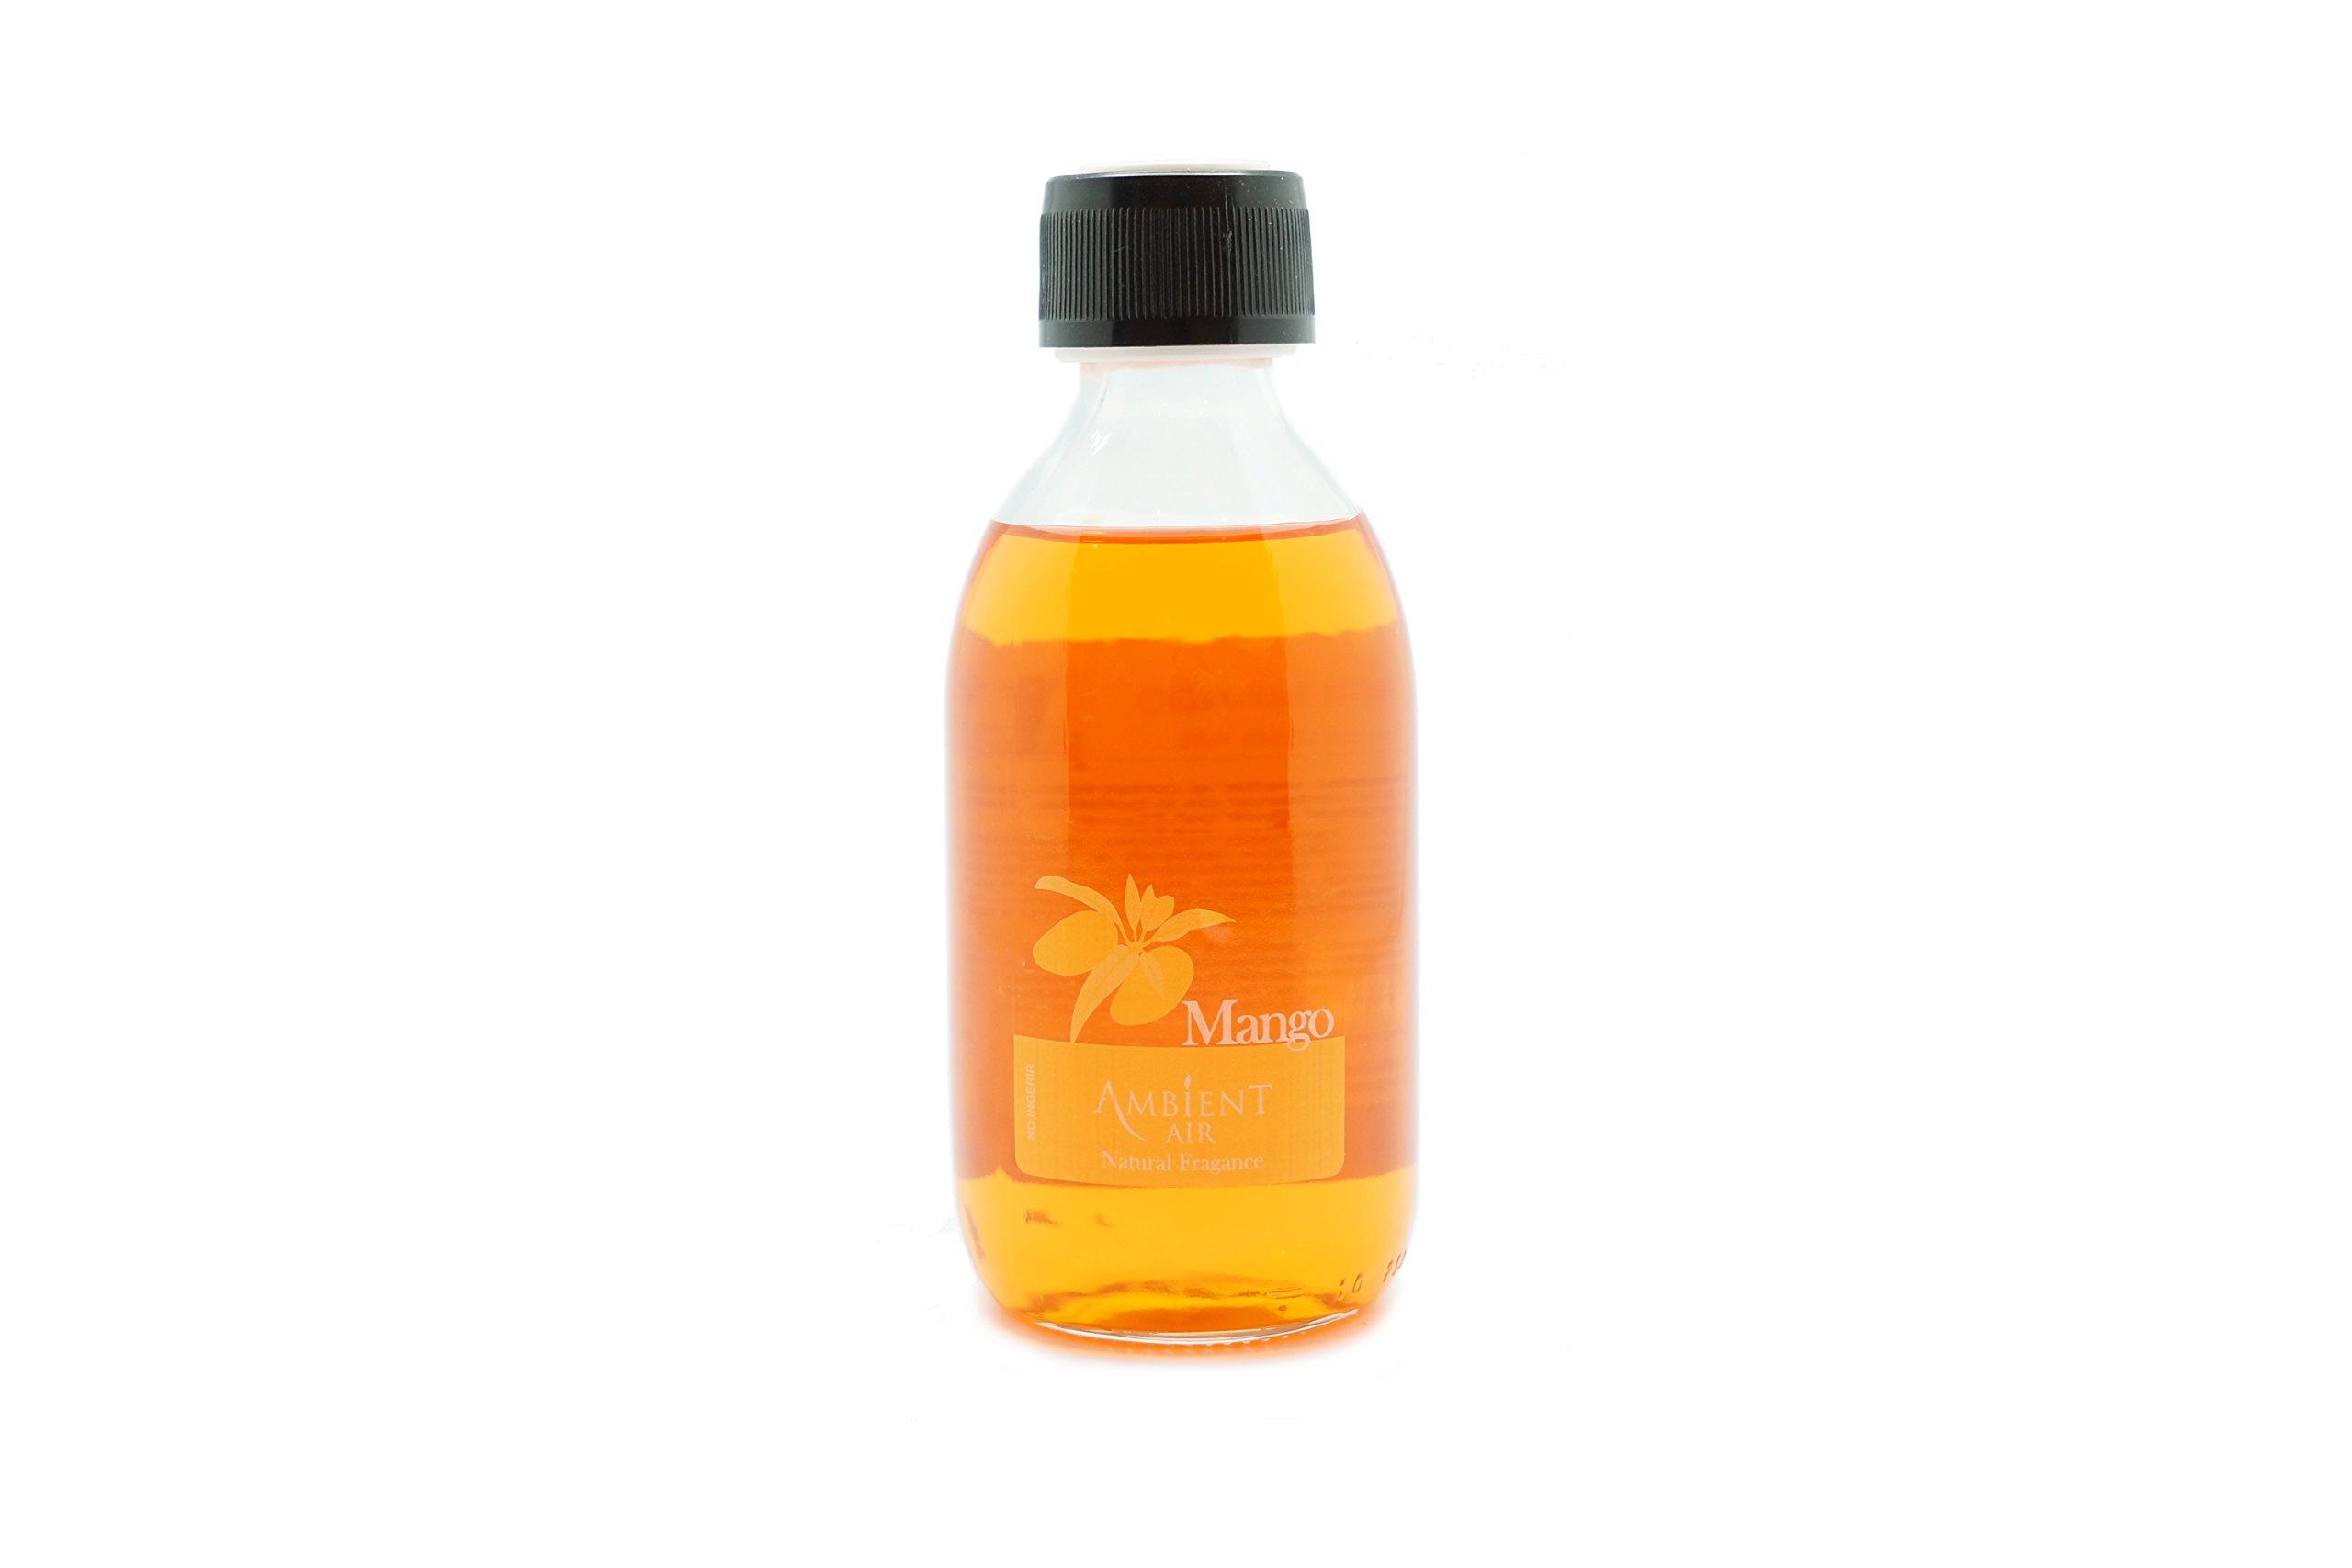 Ambientair RC250MNA Recambio Mikado, Fragancia Mango, Cristal, Naranja, 250 Ml: Amazon.es: Hogar